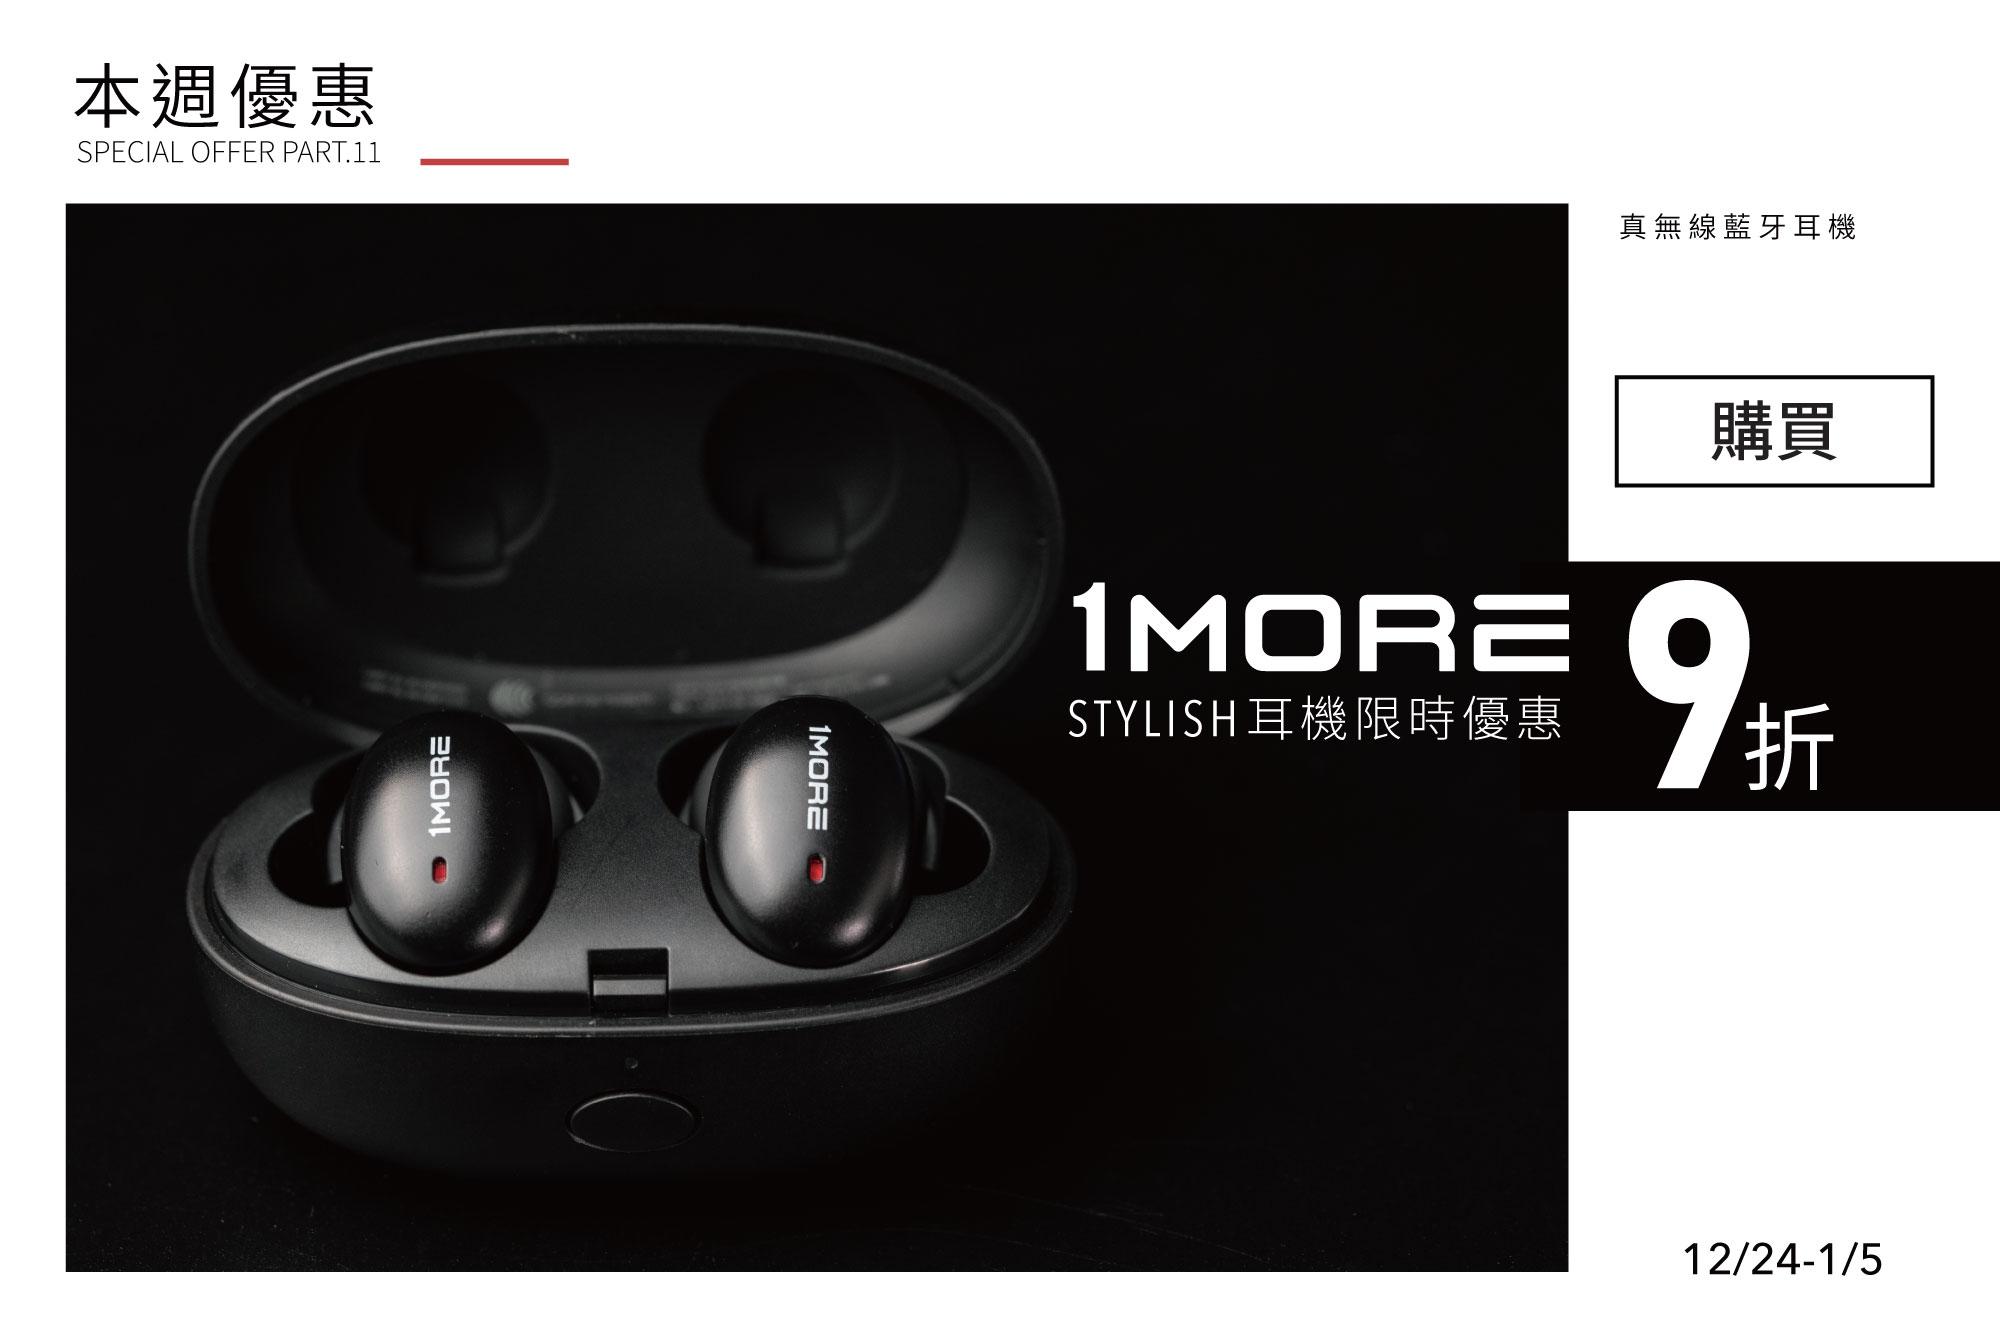 iphone手機殼 慶季大富翁-1more萬魔 藍芽耳機 9折